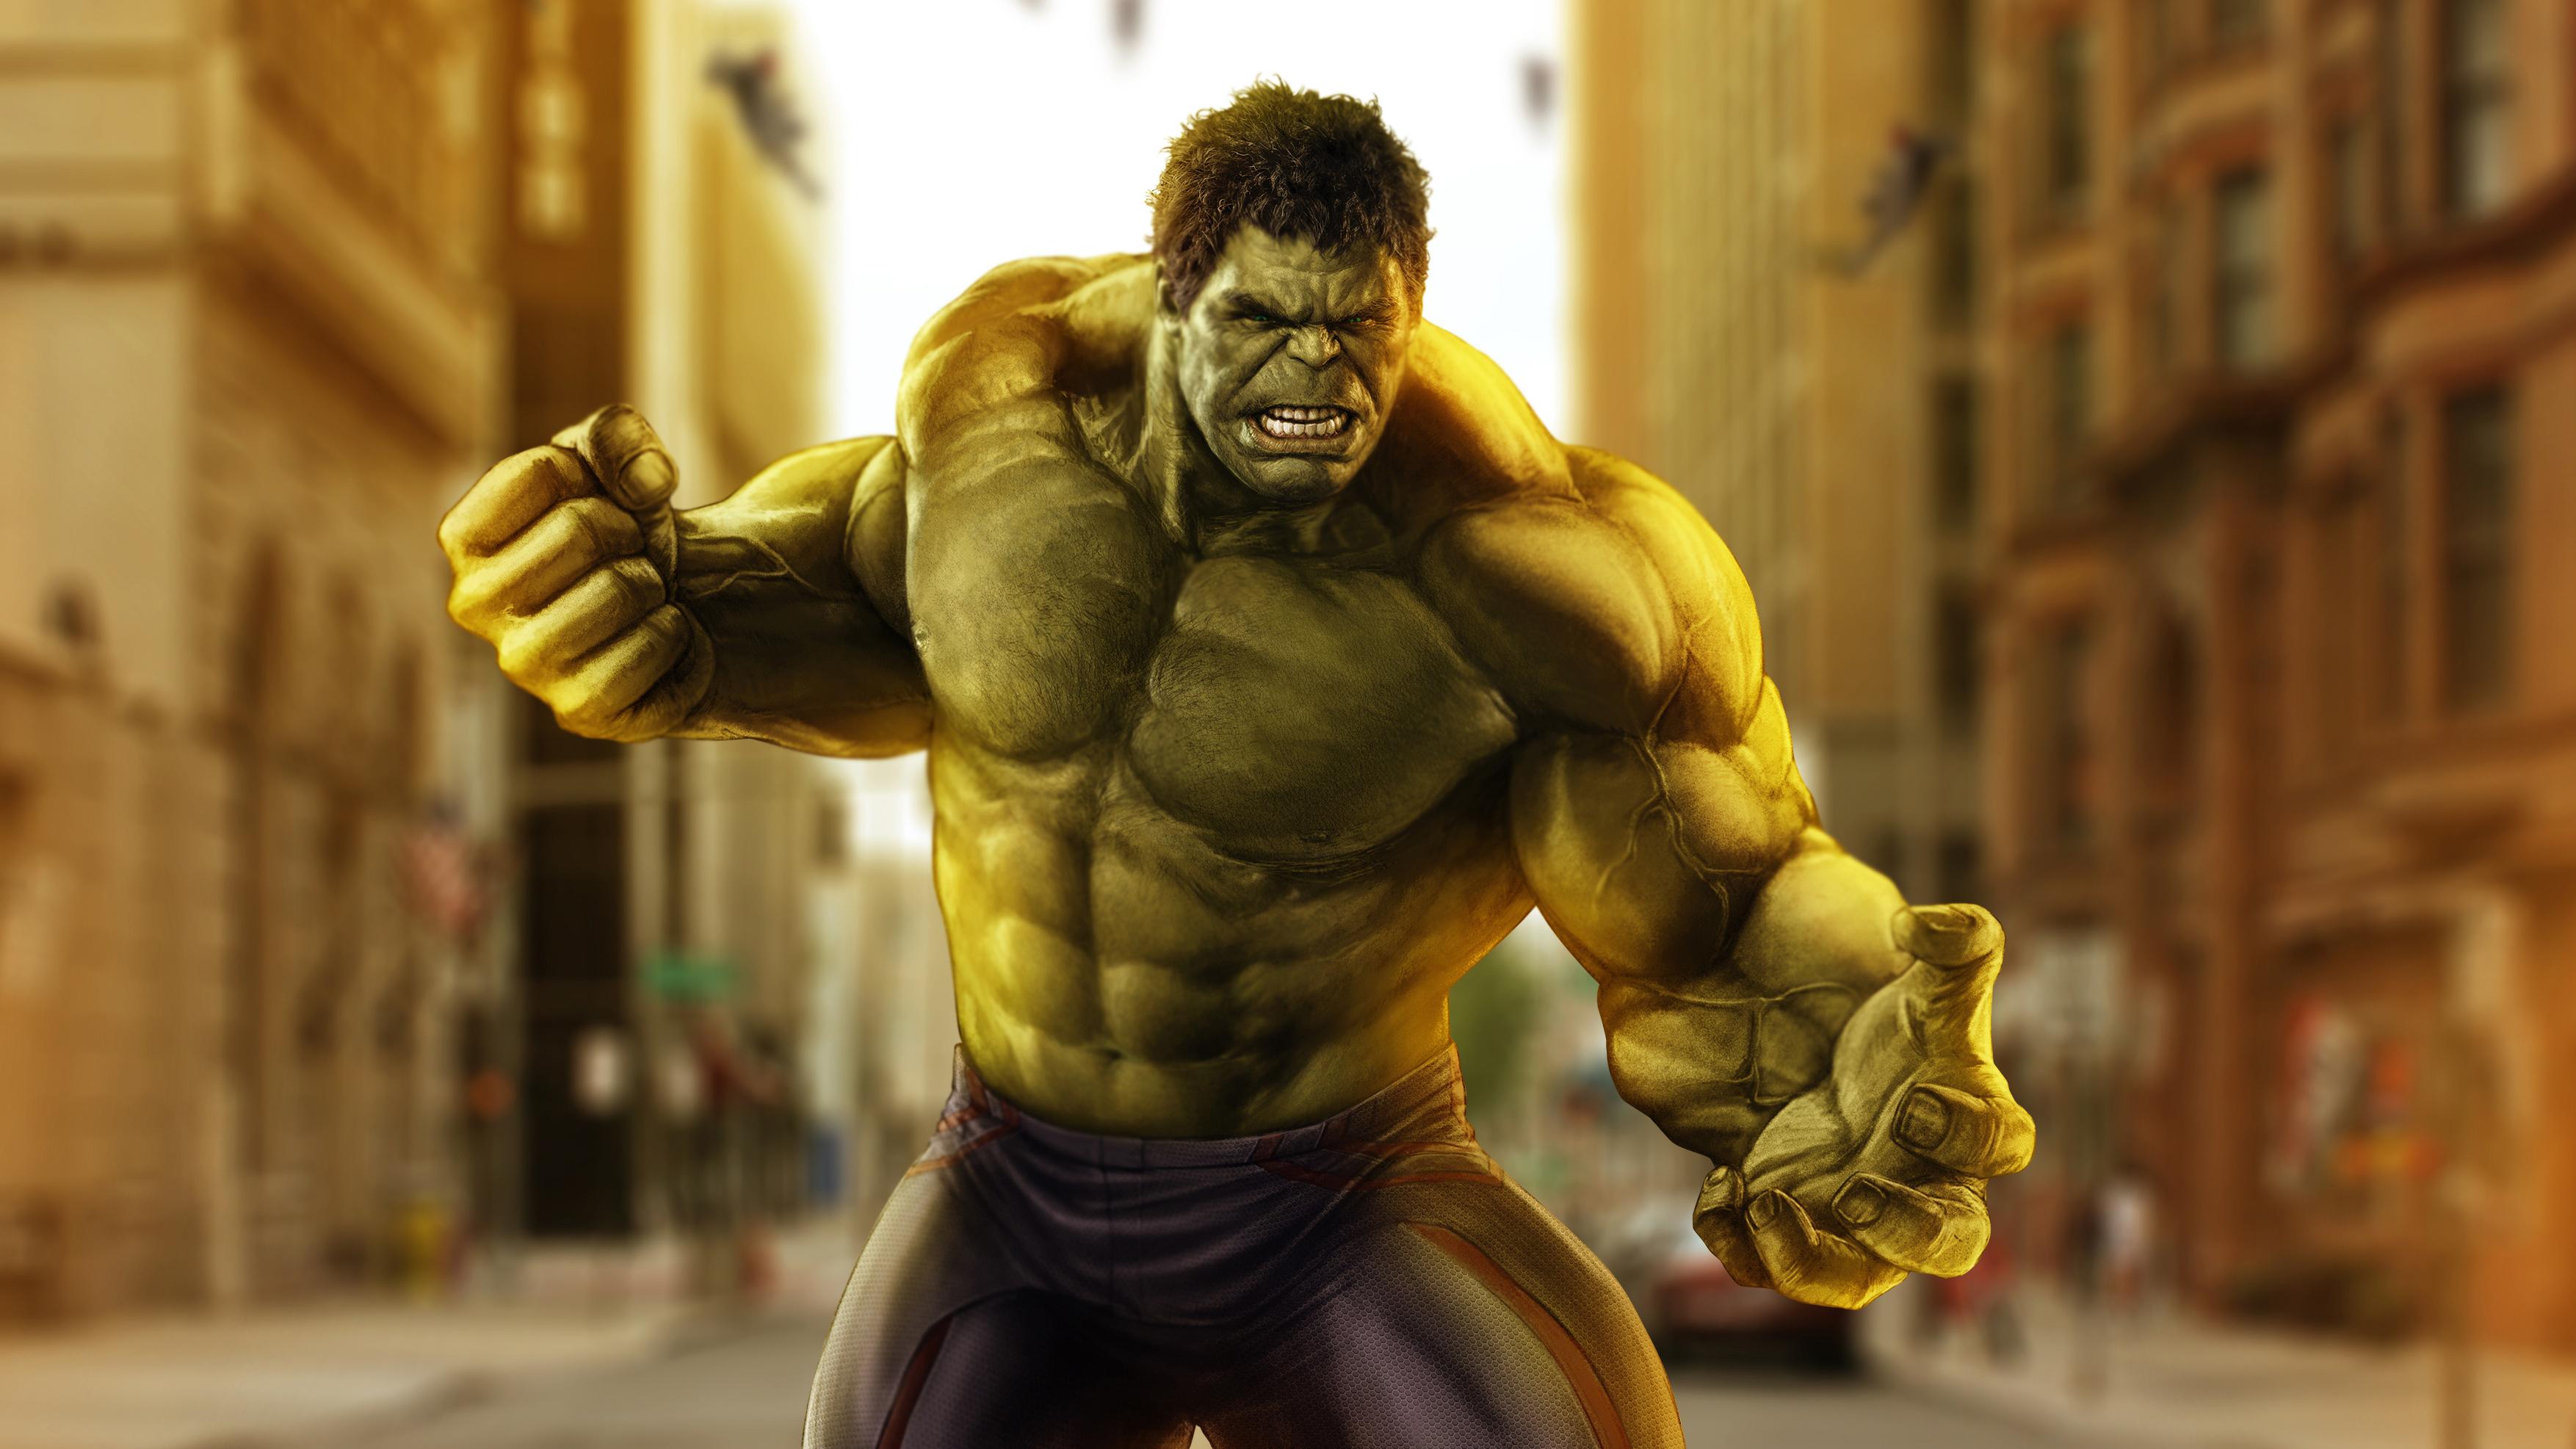 Hulk Hd Wallpaper Background Image 3508x1973 Id 976765